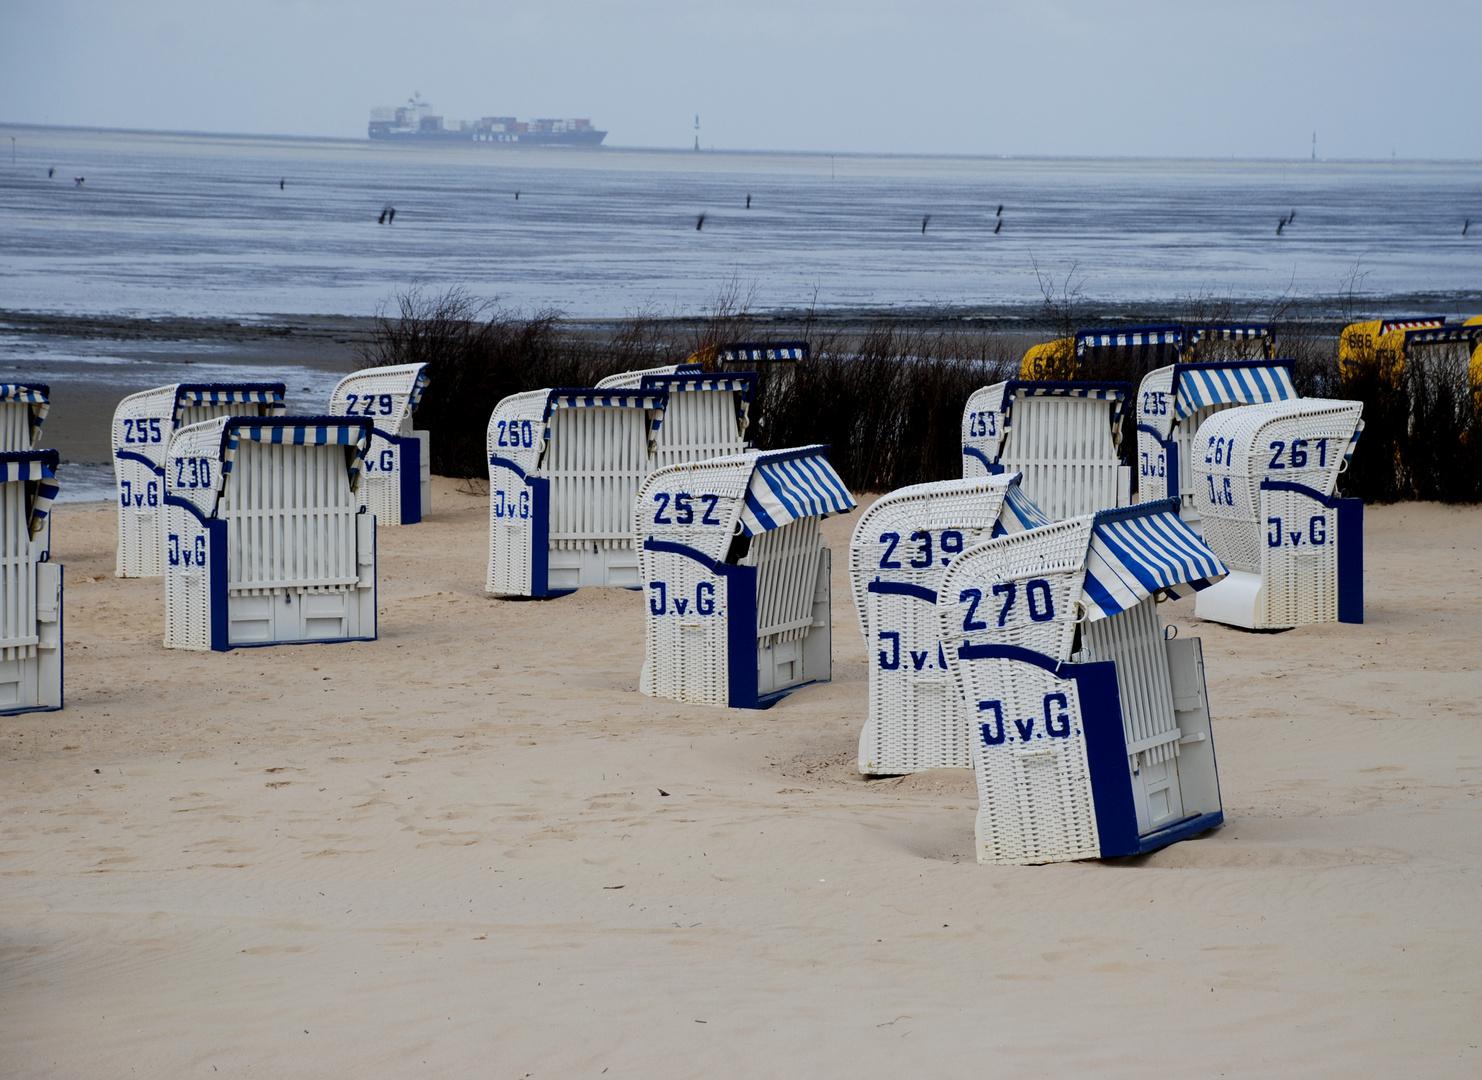 Cuxhaven - Strandkorbimpressionen